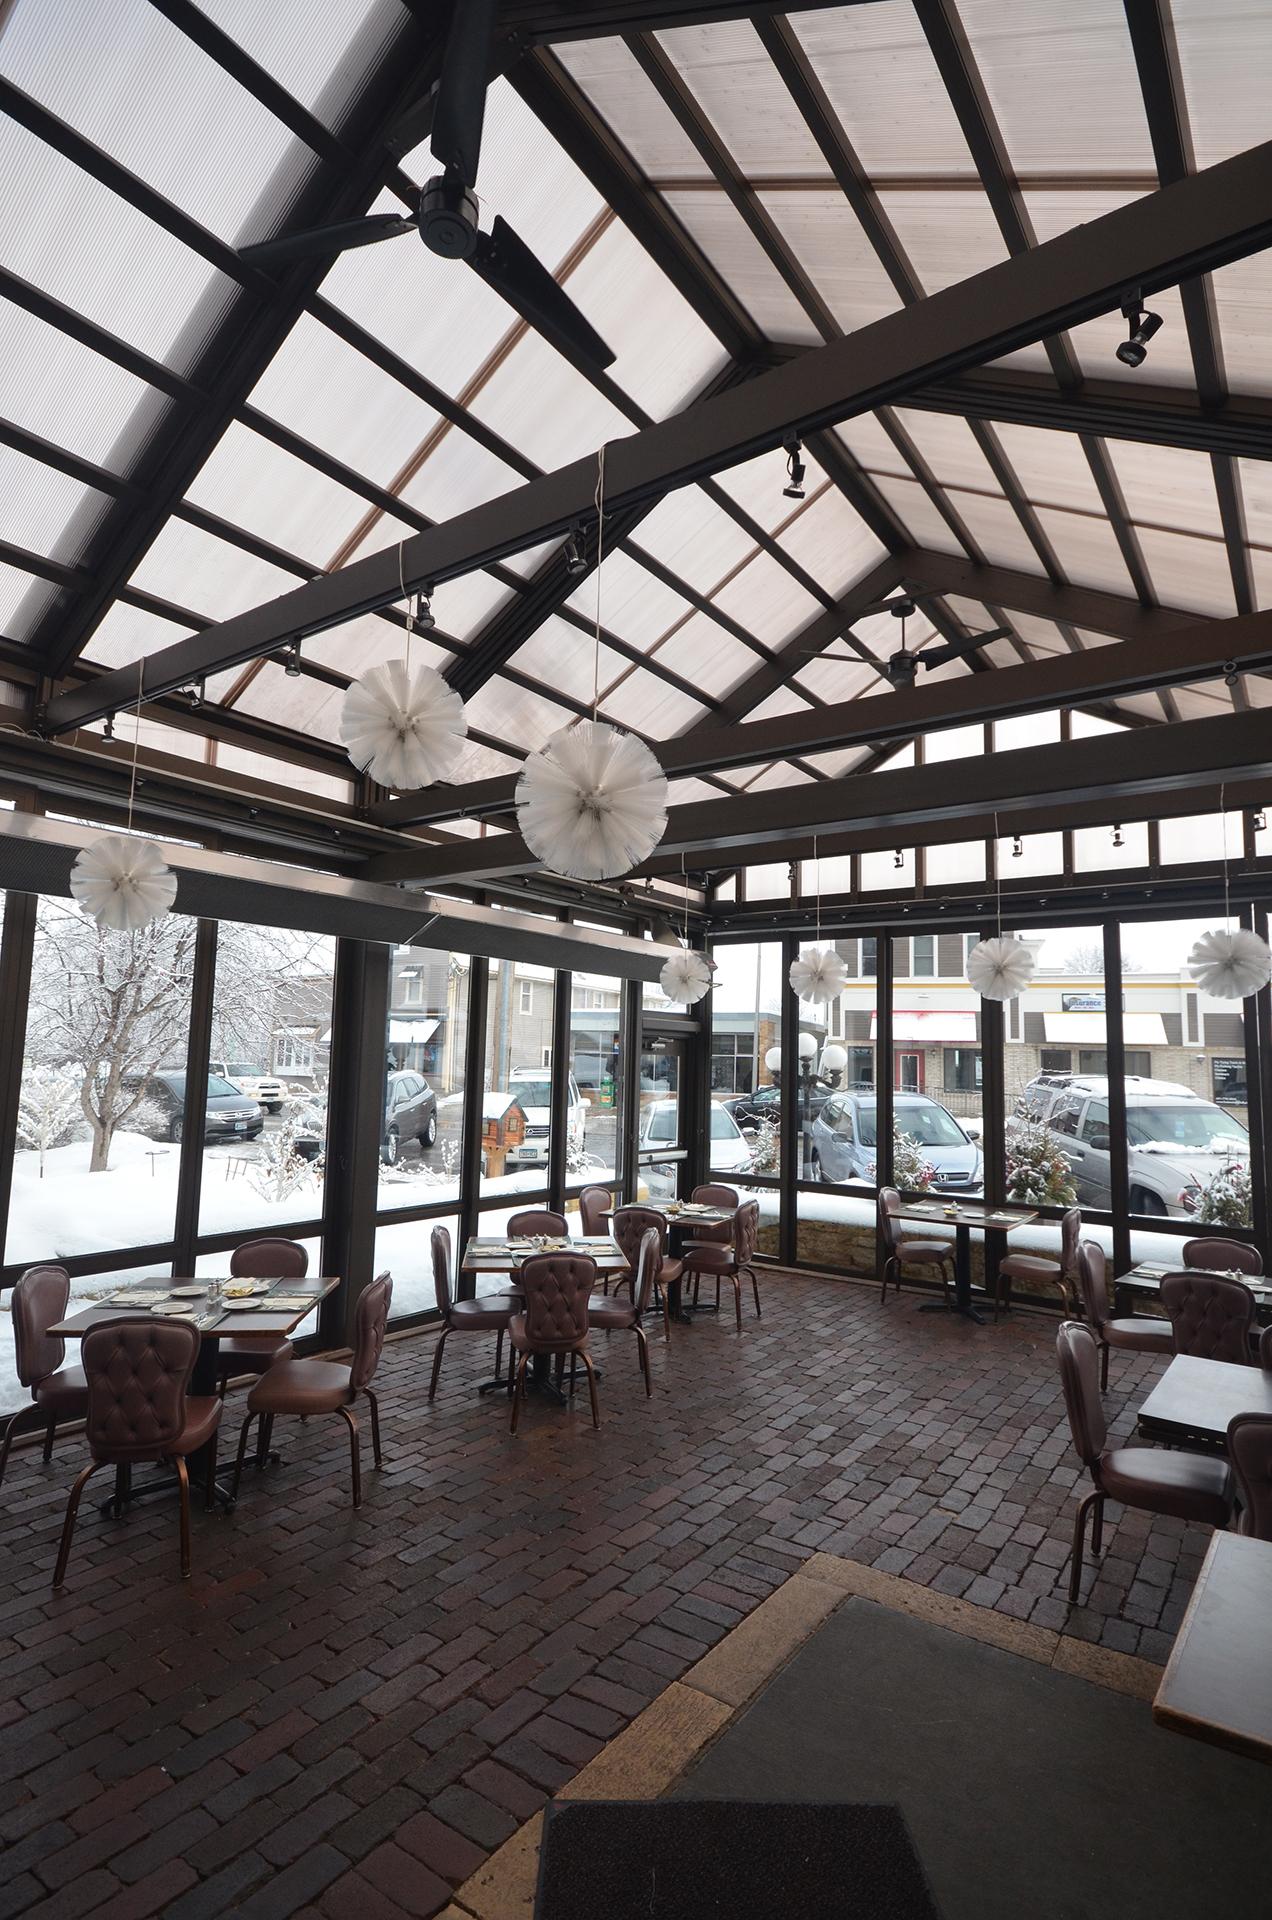 Restaurant patio in the winter